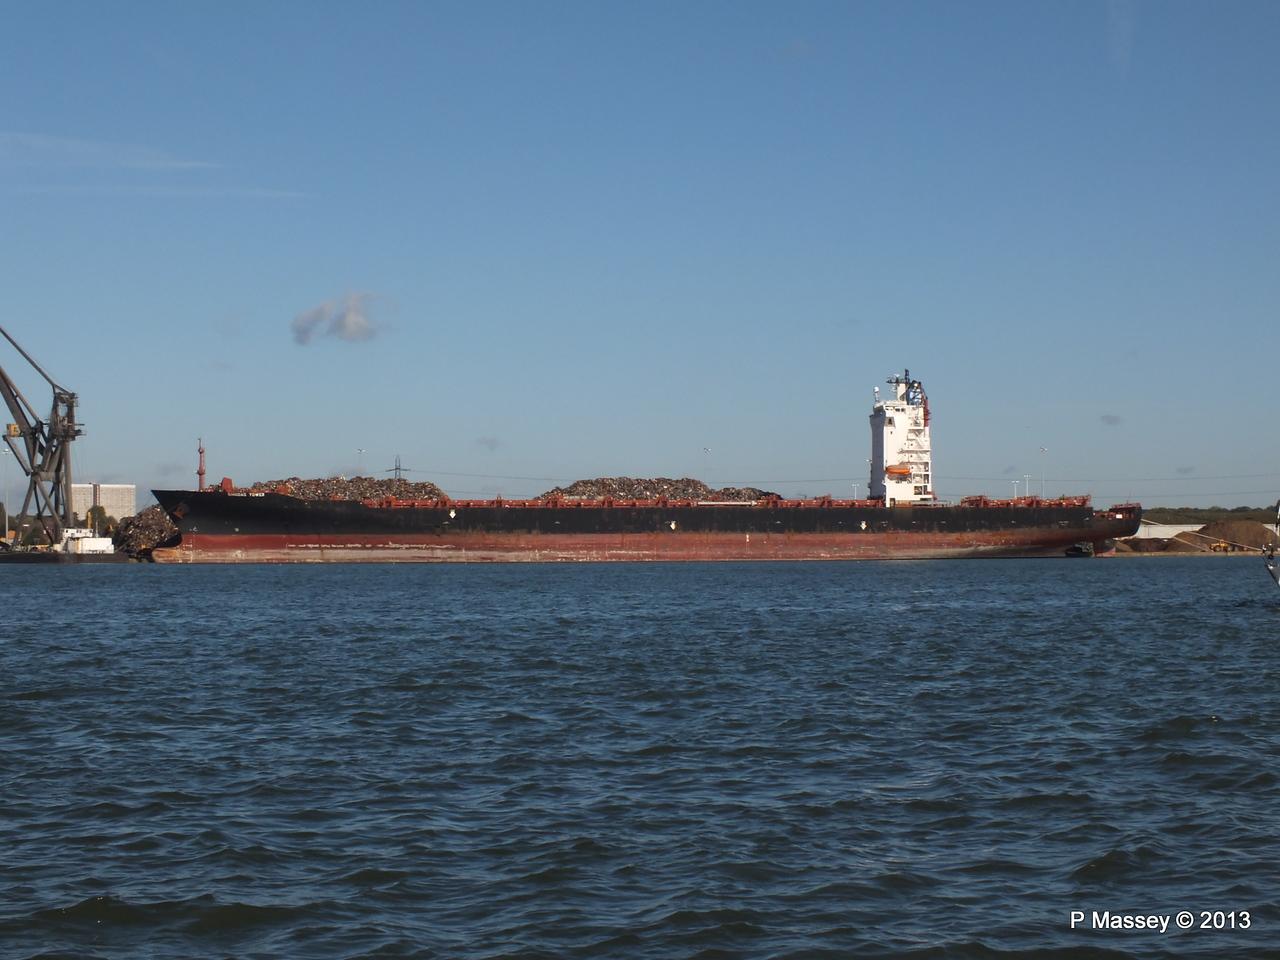 QINGDAO TOWER Southampton PDM 04-11-2013 12-43-35